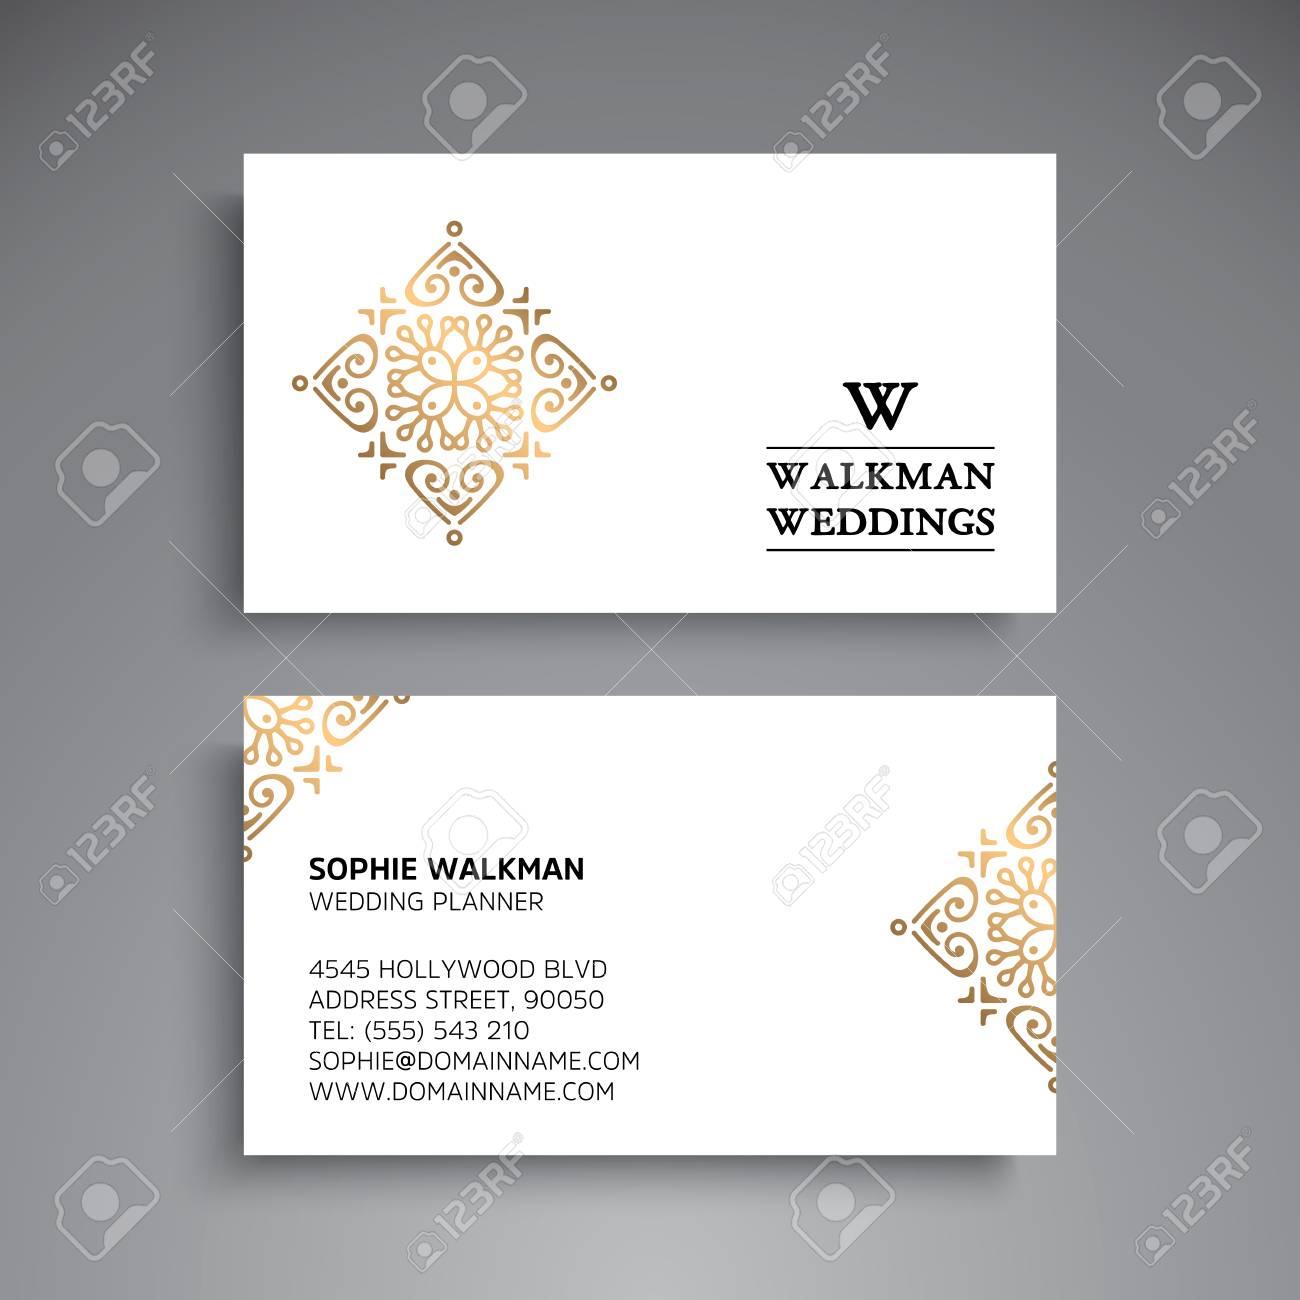 Business card vintage decorative elements ornamental floral business card vintage decorative elements ornamental floral business cards or invitation with mandala stock stopboris Images